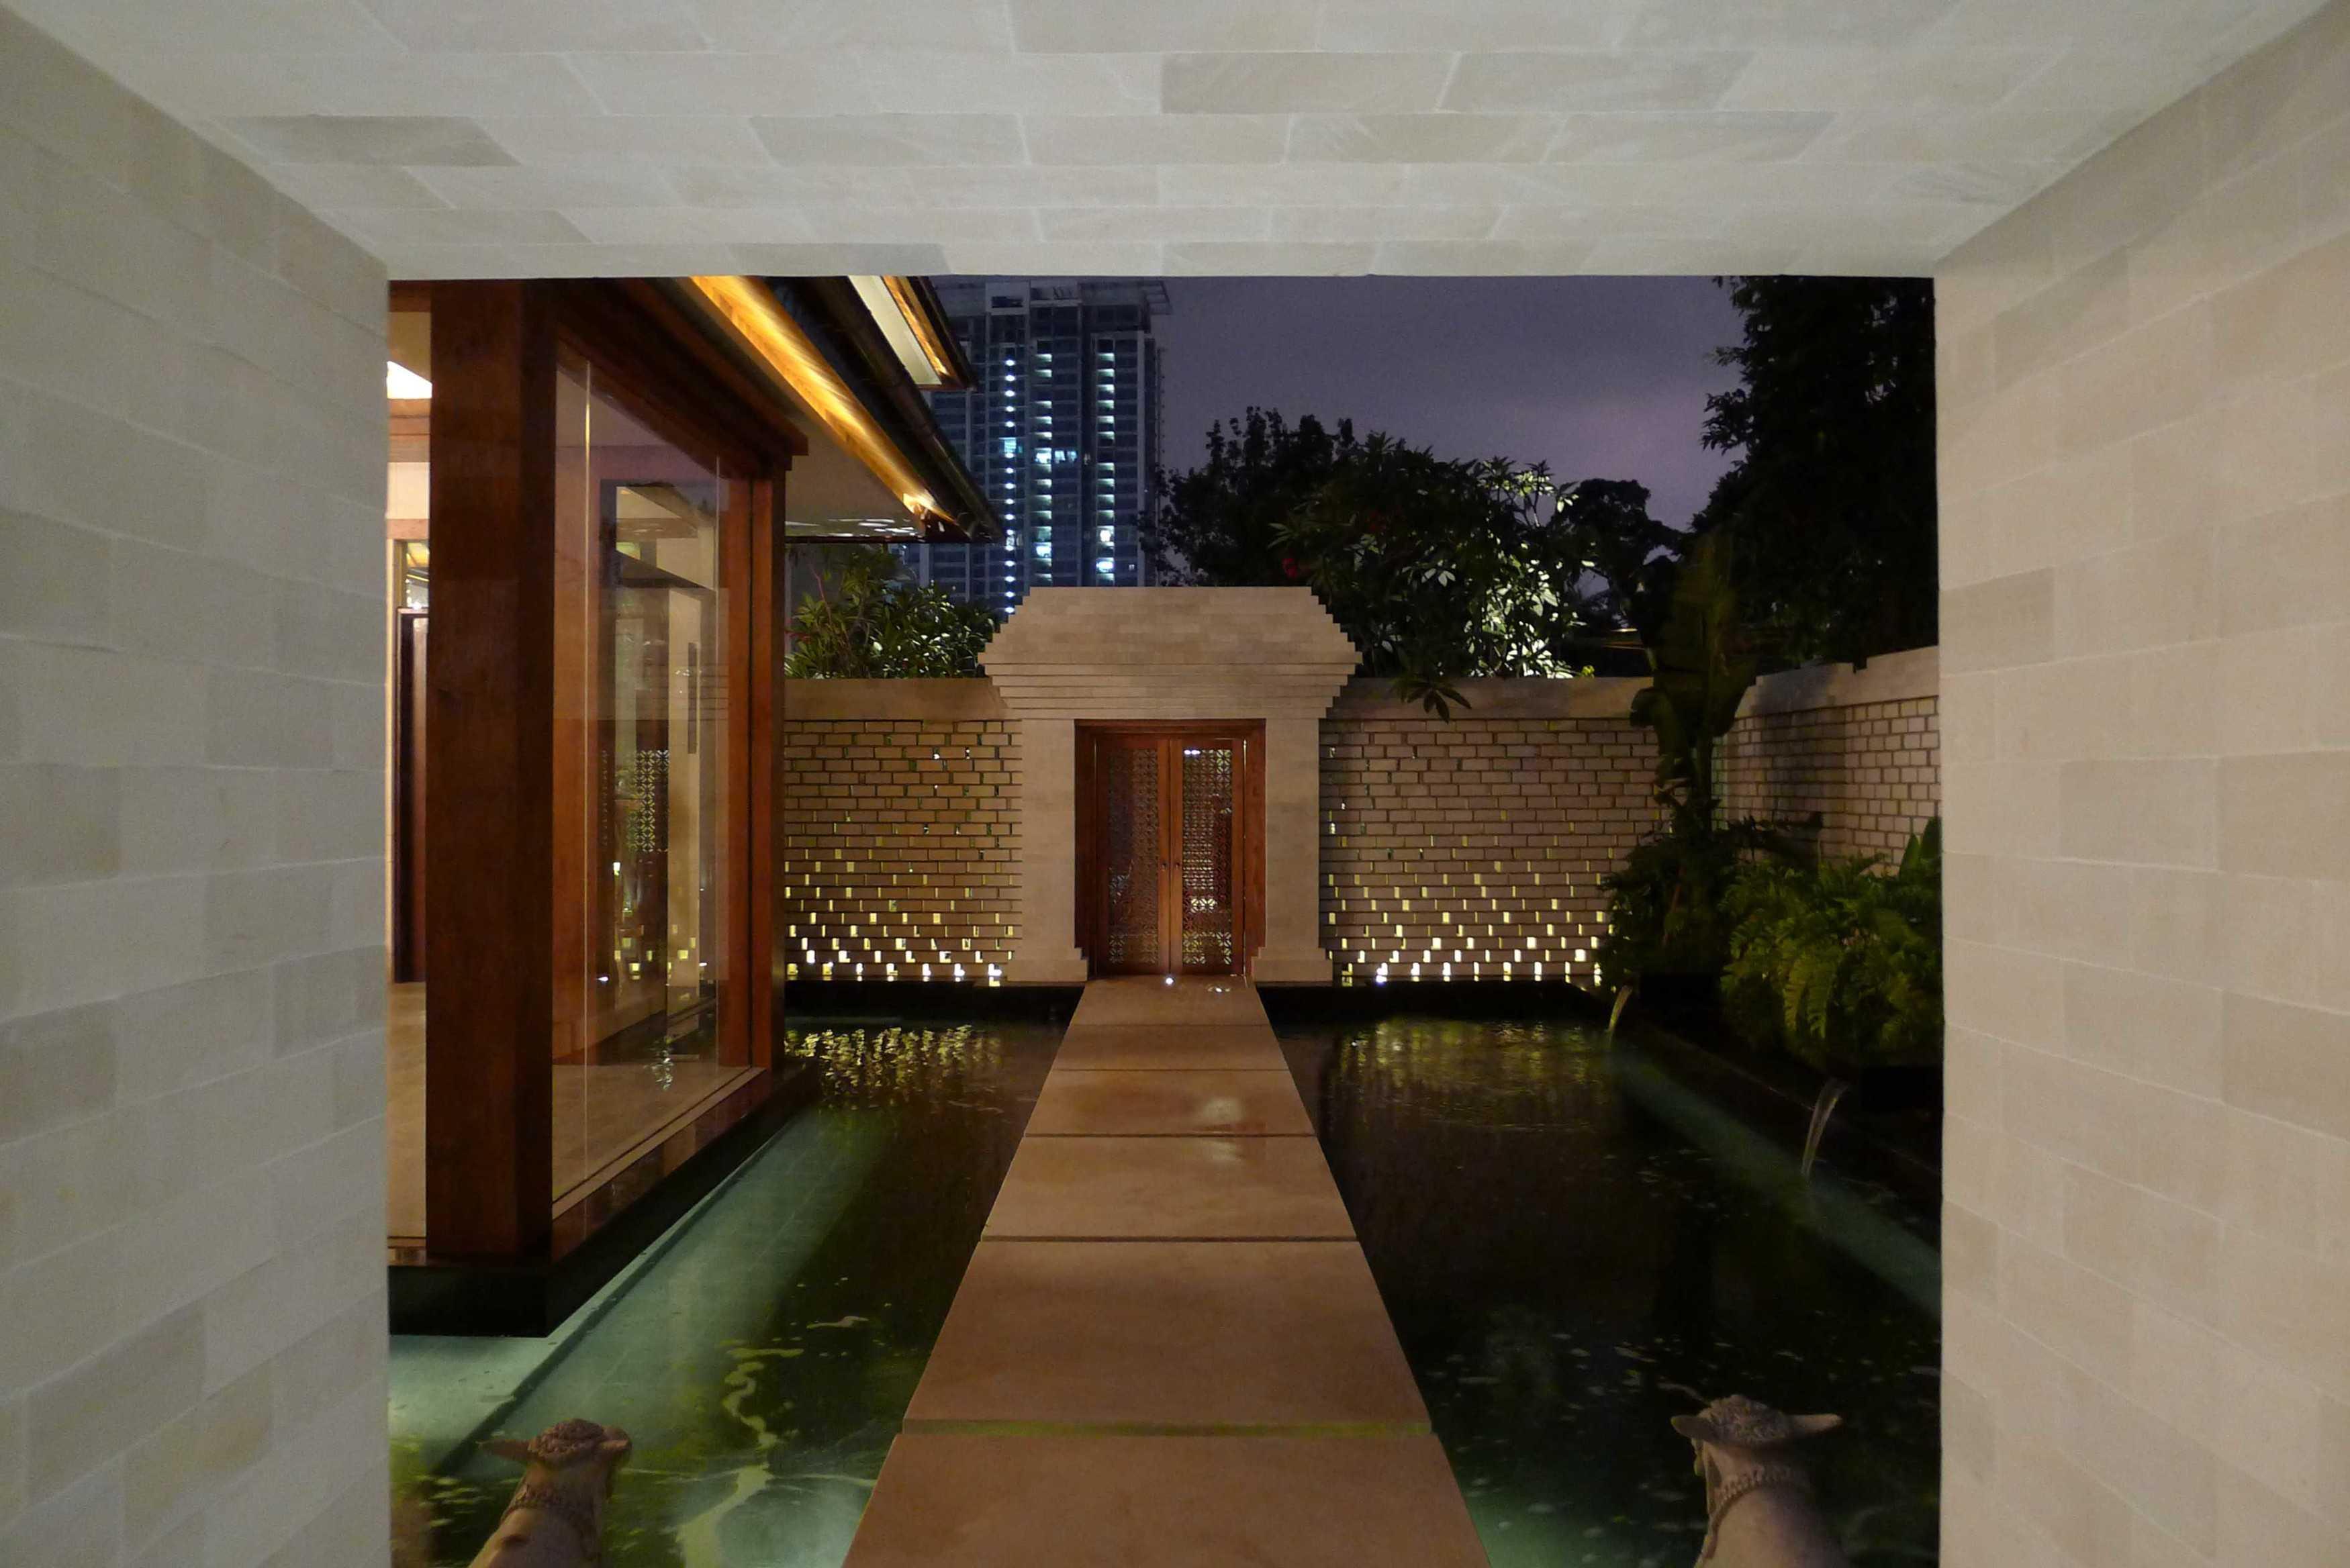 Han Awal & Partners Rumah Tinggal Brawijaya  Jakarta Jakarta Entrance Door   16125